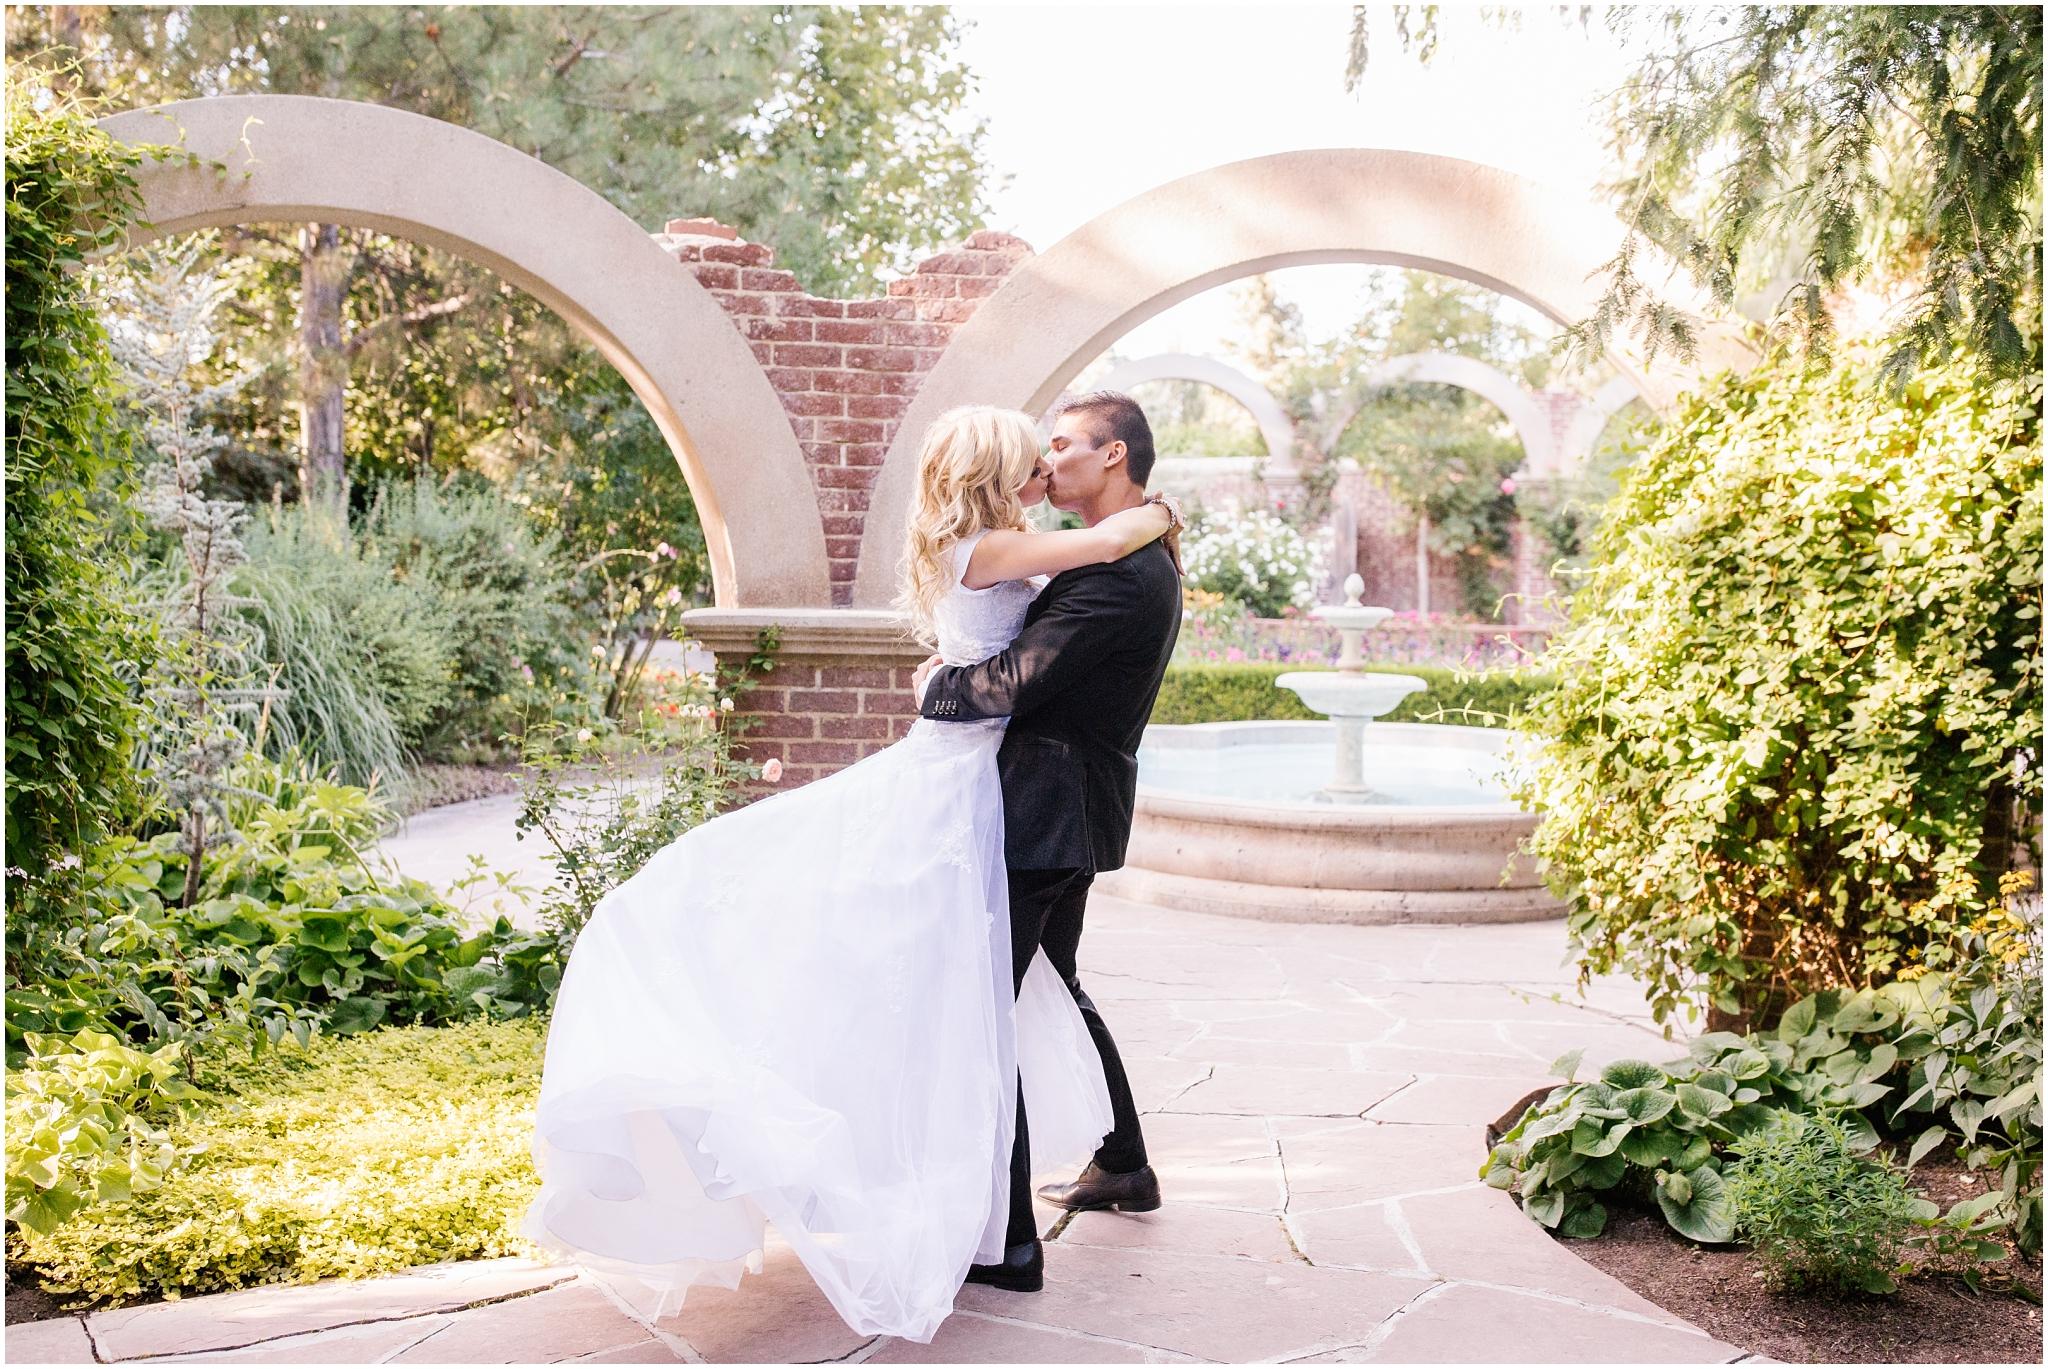 CHBridals-18_Lizzie-B-Imagery-Utah-Wedding-Photographer-Central-Utah-Park-City-Salt-Lake-City-Thanksgiving-Point-Bridals-Ashton-Gardens.jpg